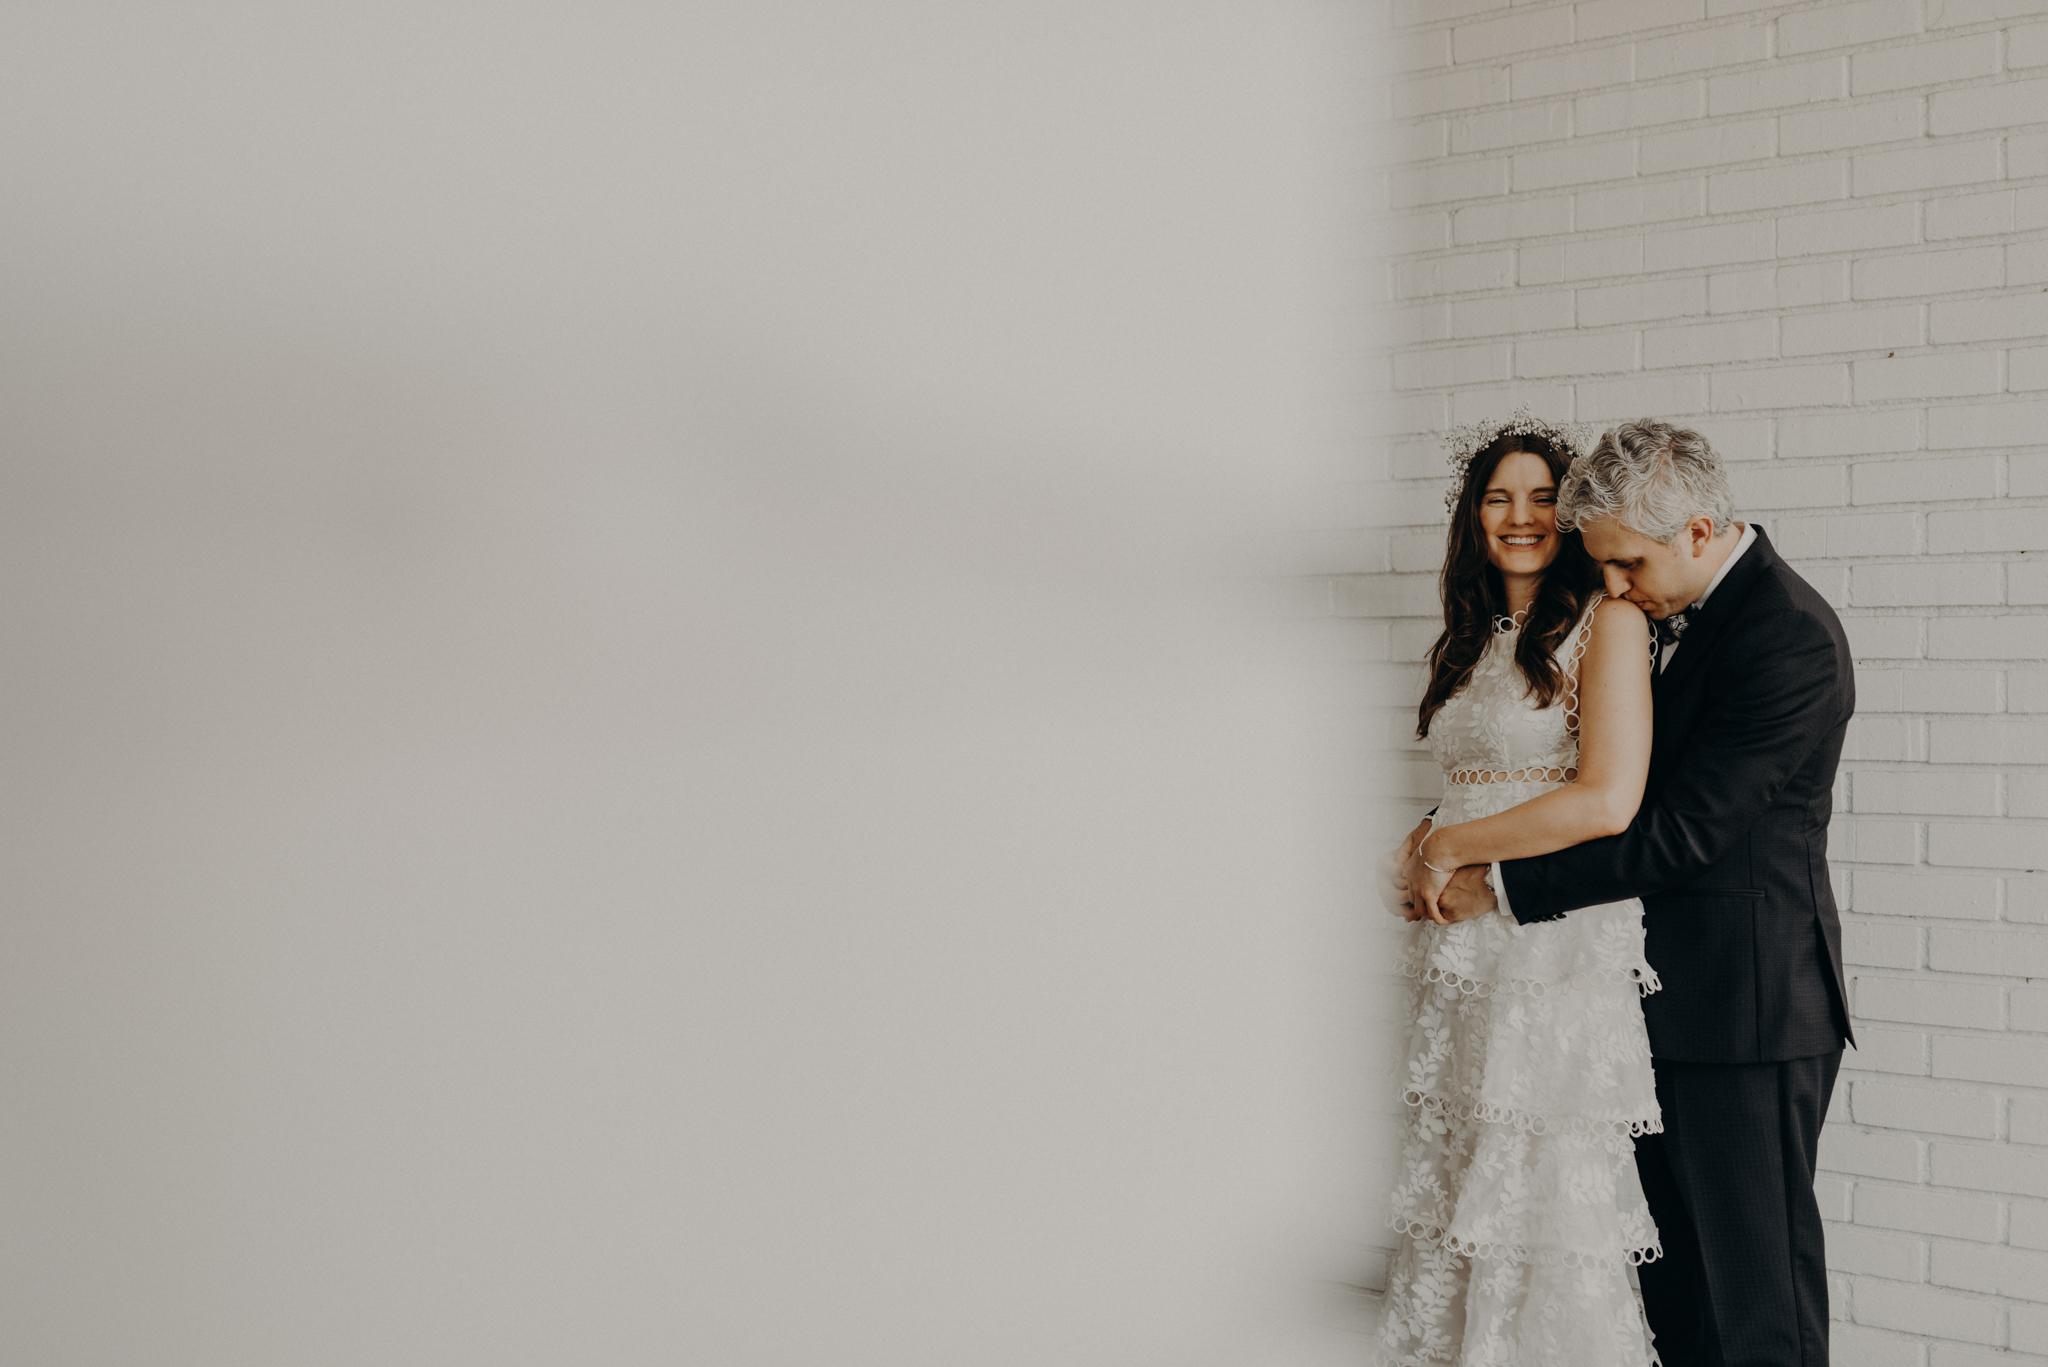 Isaiah + Taylor Photography - Private Estate Backyard Wedding - Beverly Hills - Los Angeles Wedding Photographer - 31.jpg